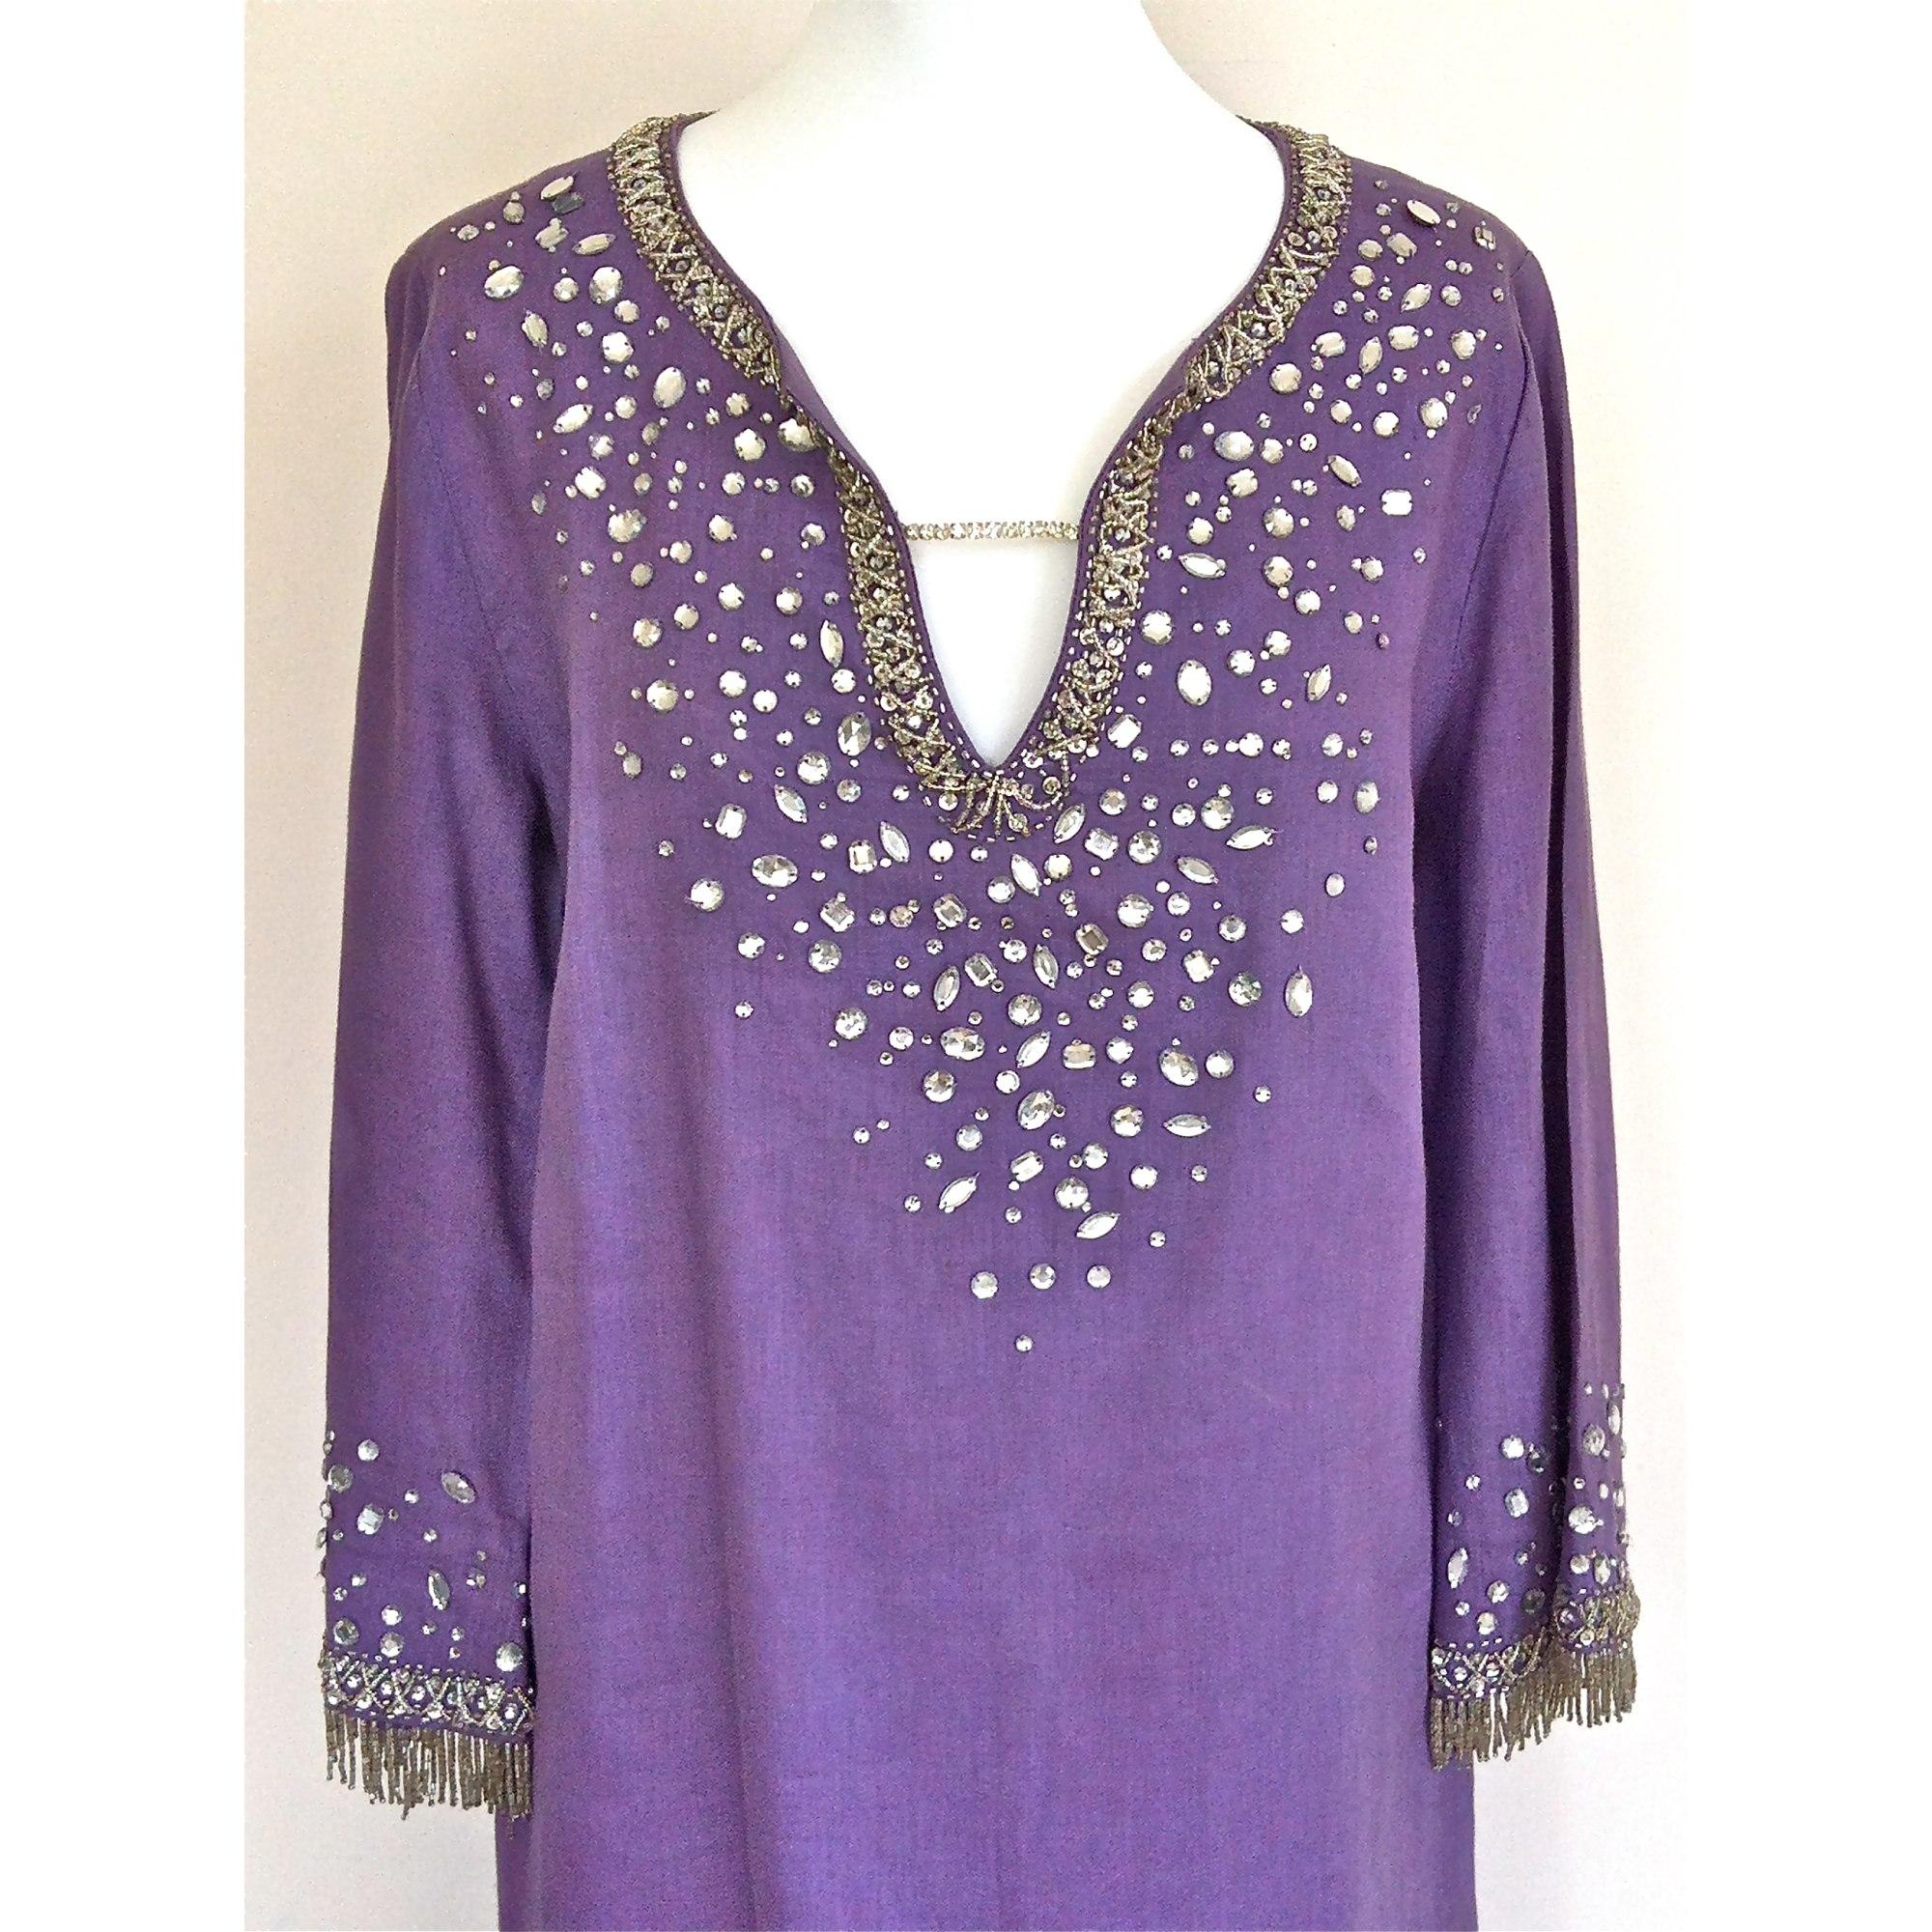 72dec197e0 Kaftan Dress LUISA SPAGNOLI 38 (M, T2) purple - 2729164